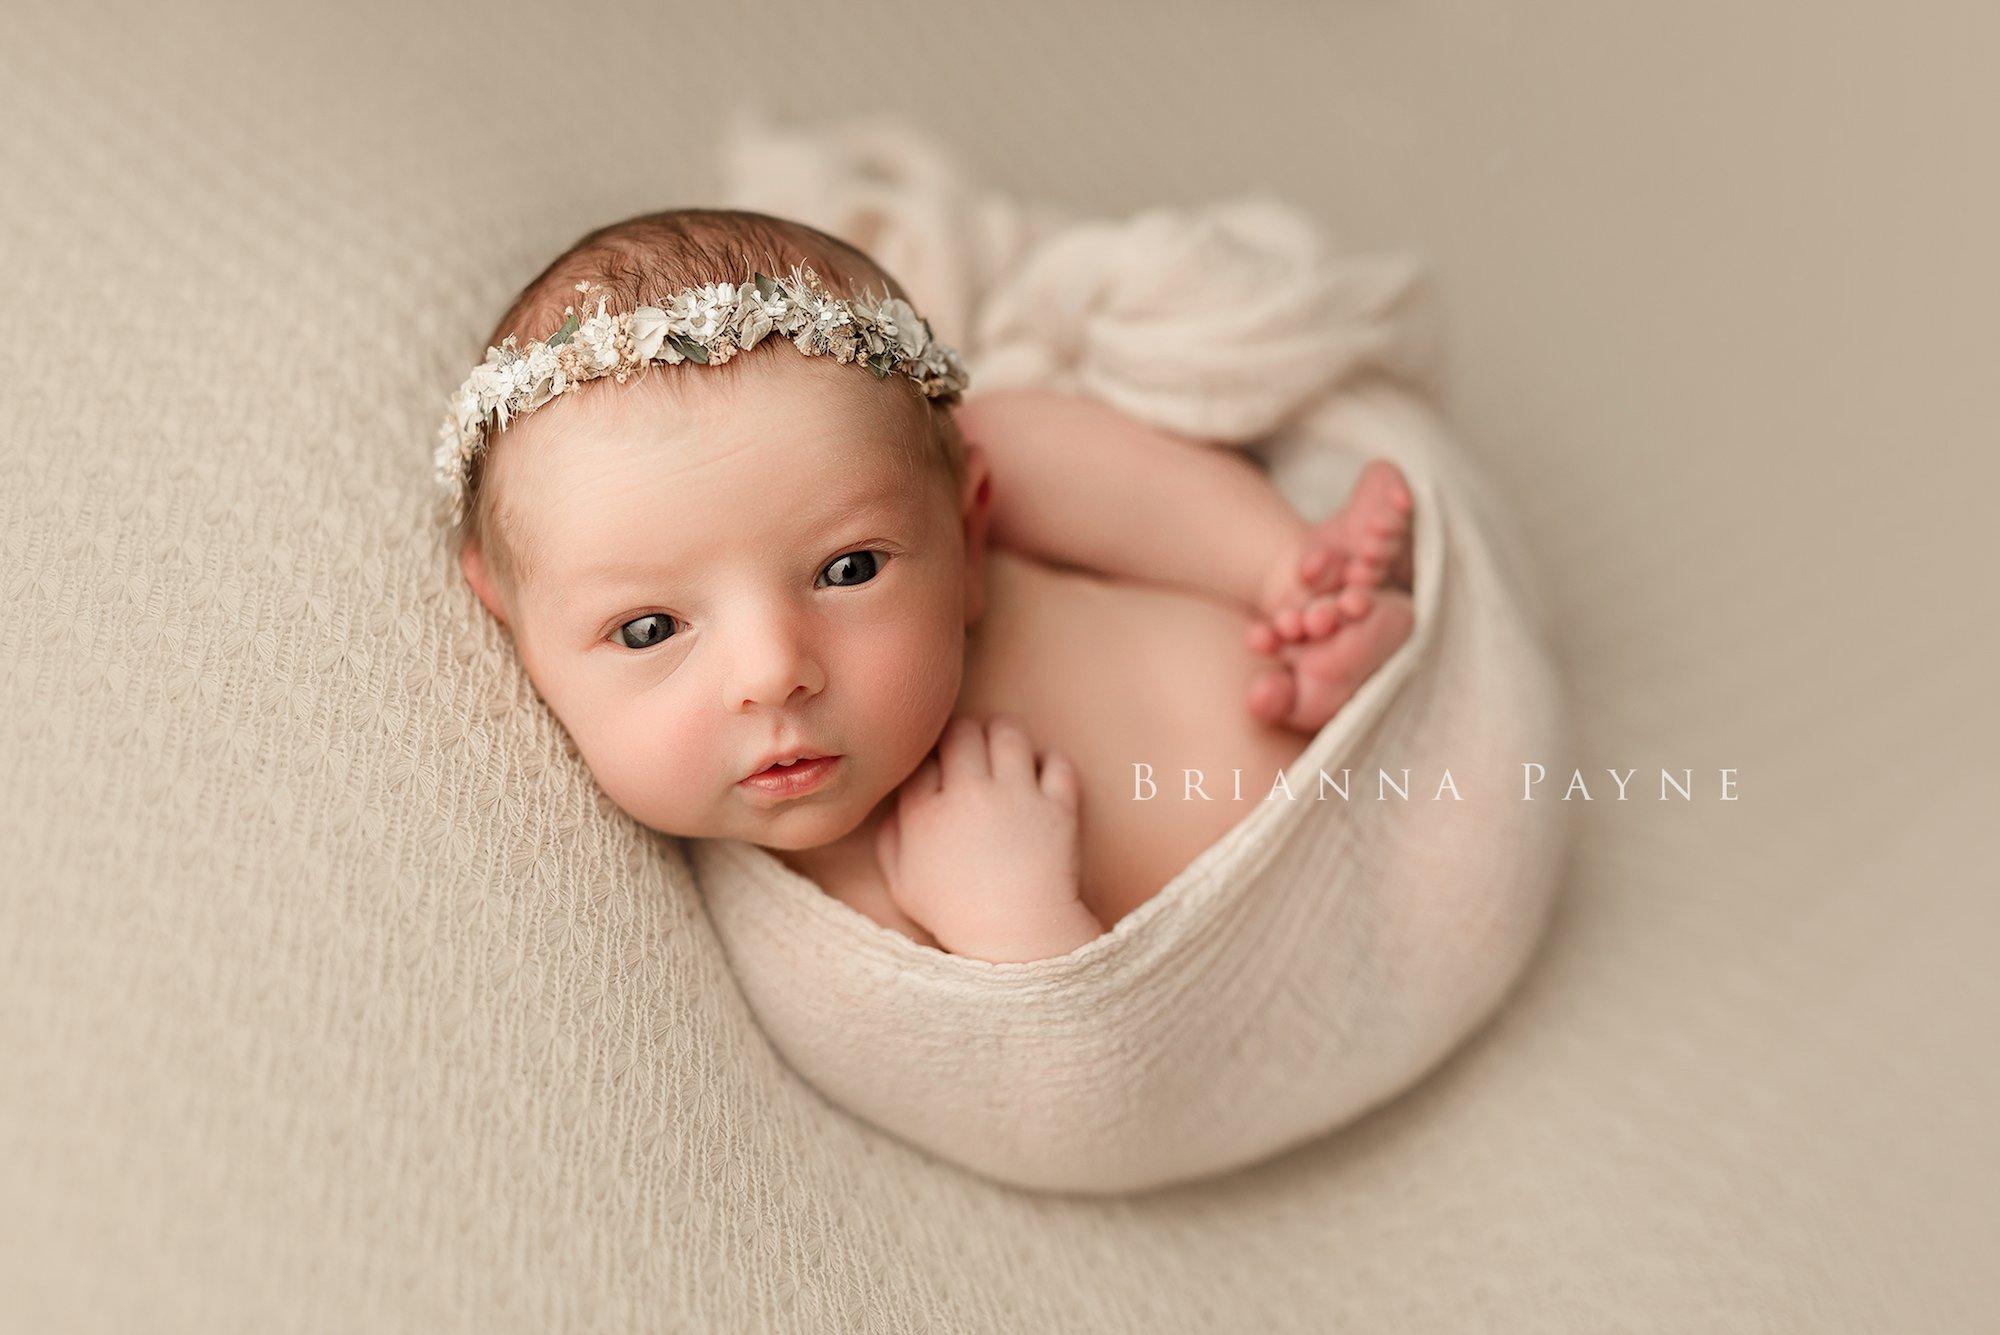 ewborn baby photography